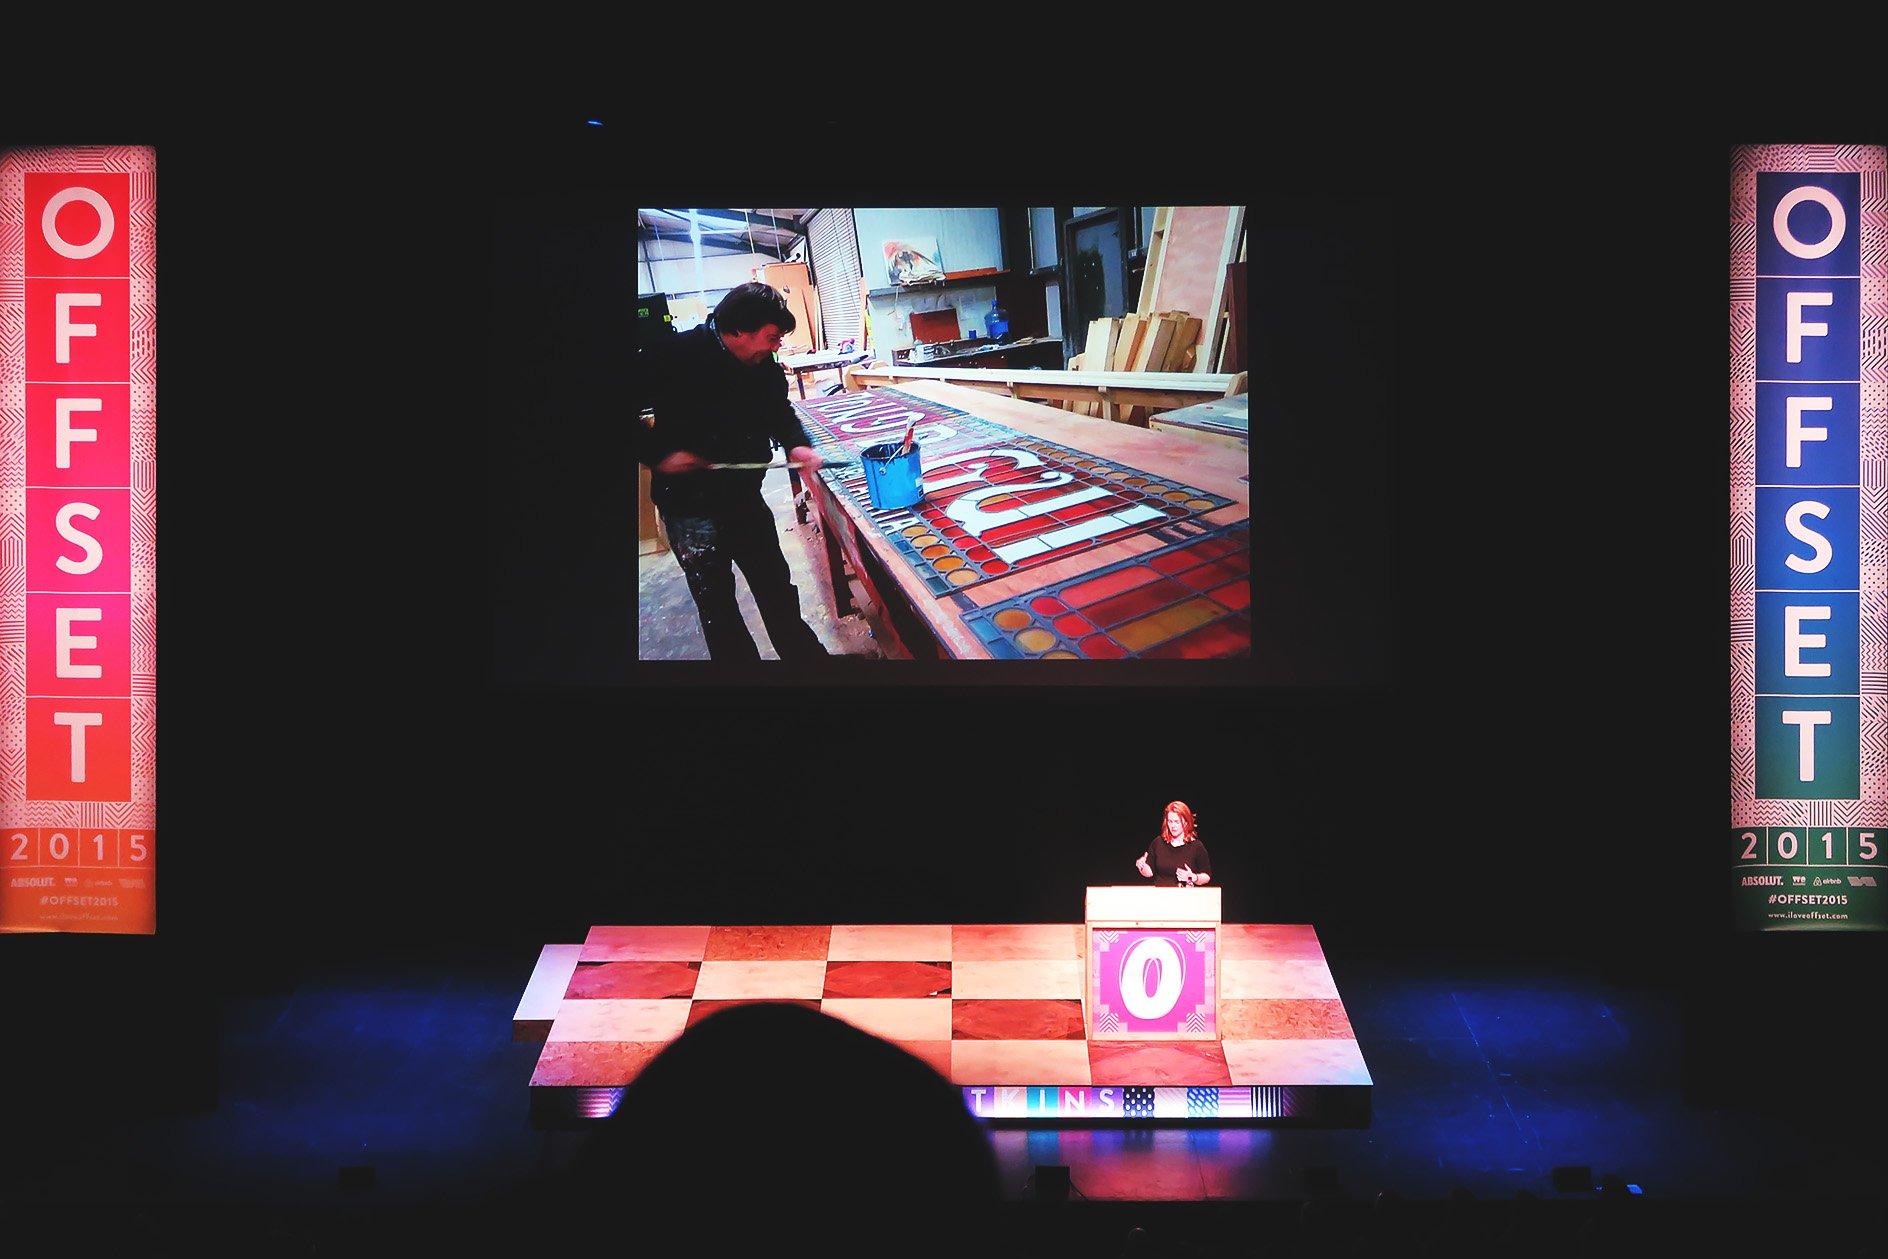 Annie Atkins at OFFSET 2015 – Making Theatre Signage